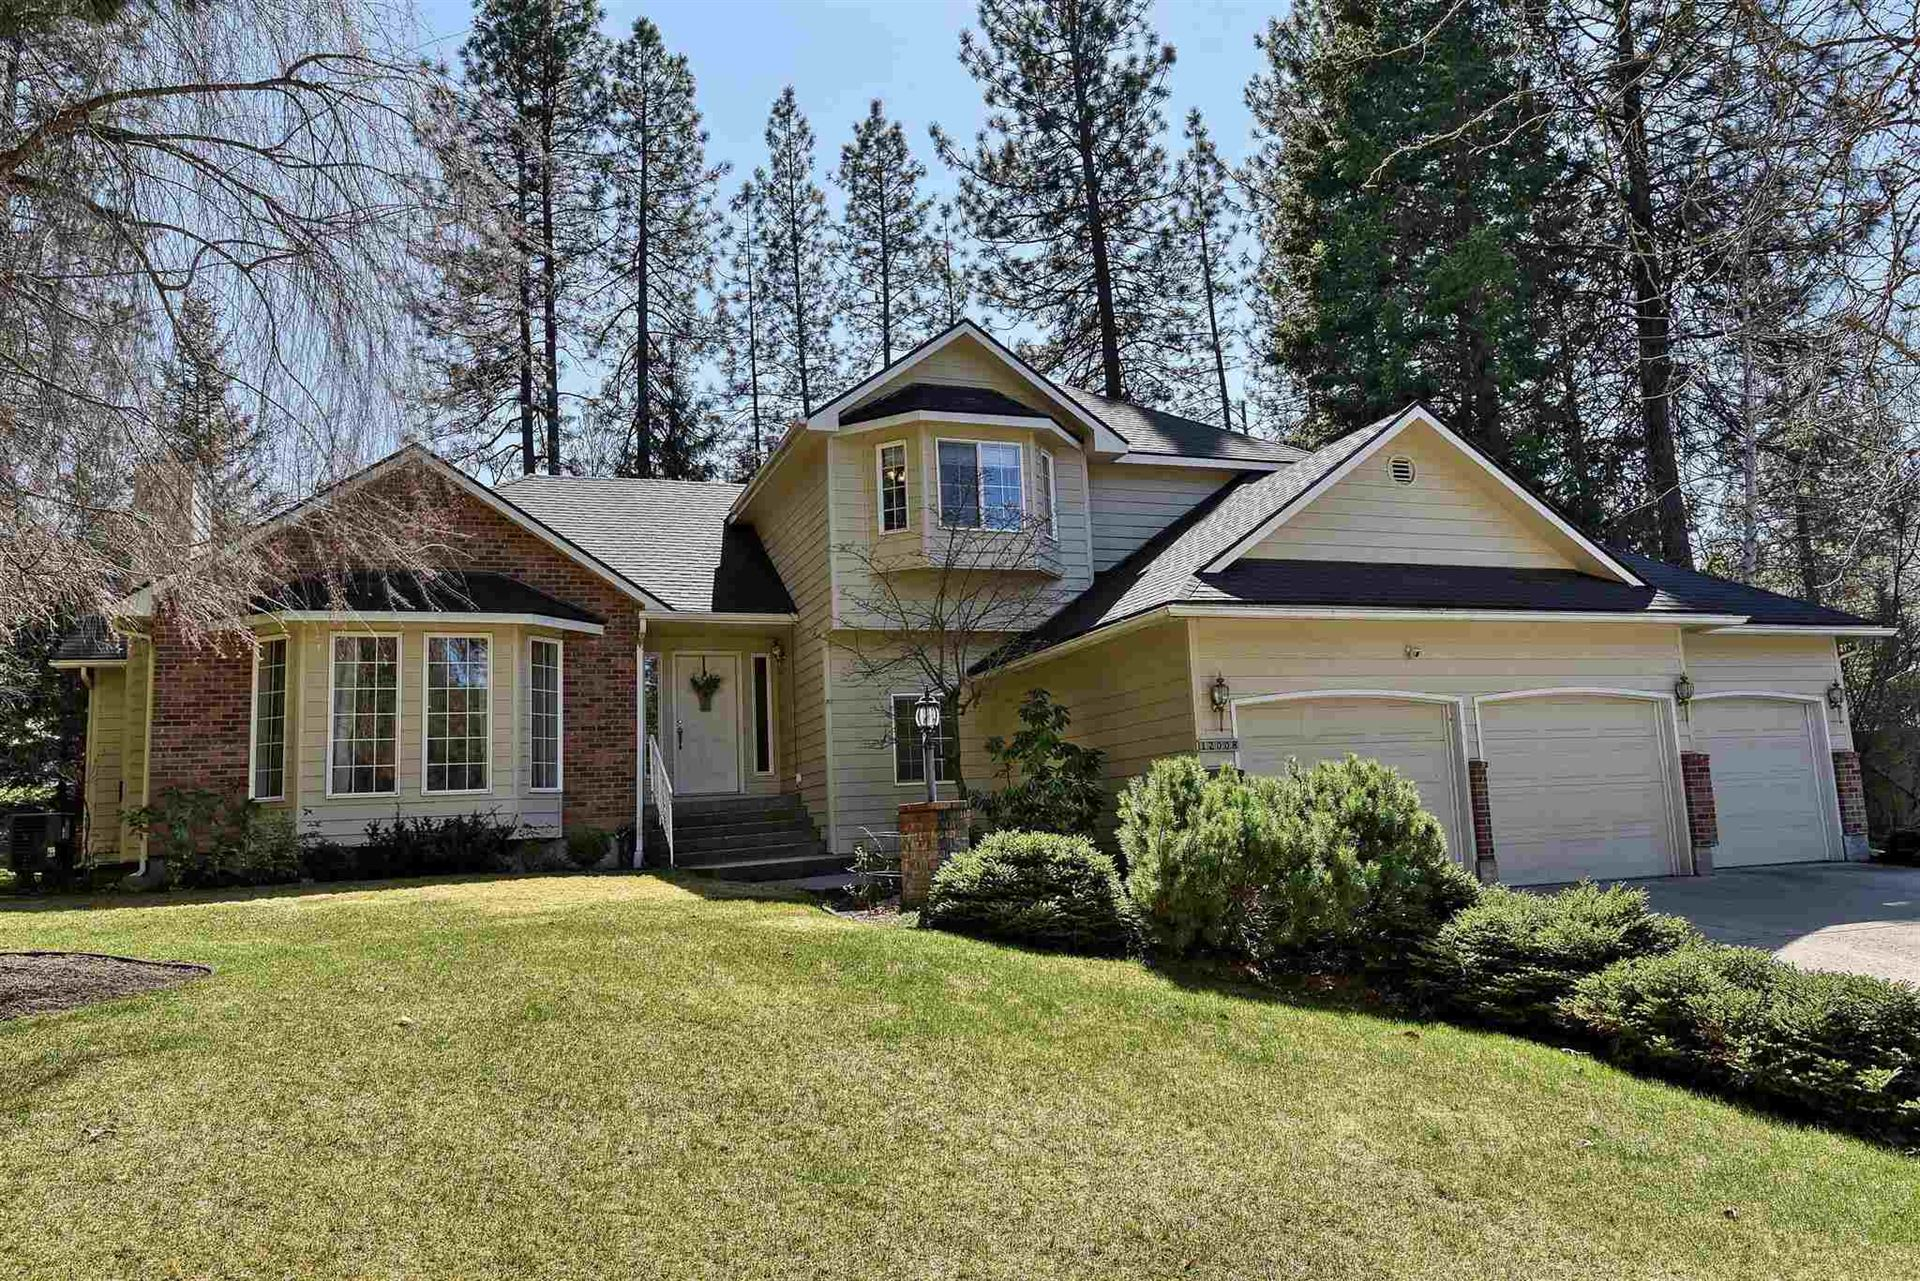 12008 N Green Hollow Ct, Spokane, WA 99218 - #: 202115855